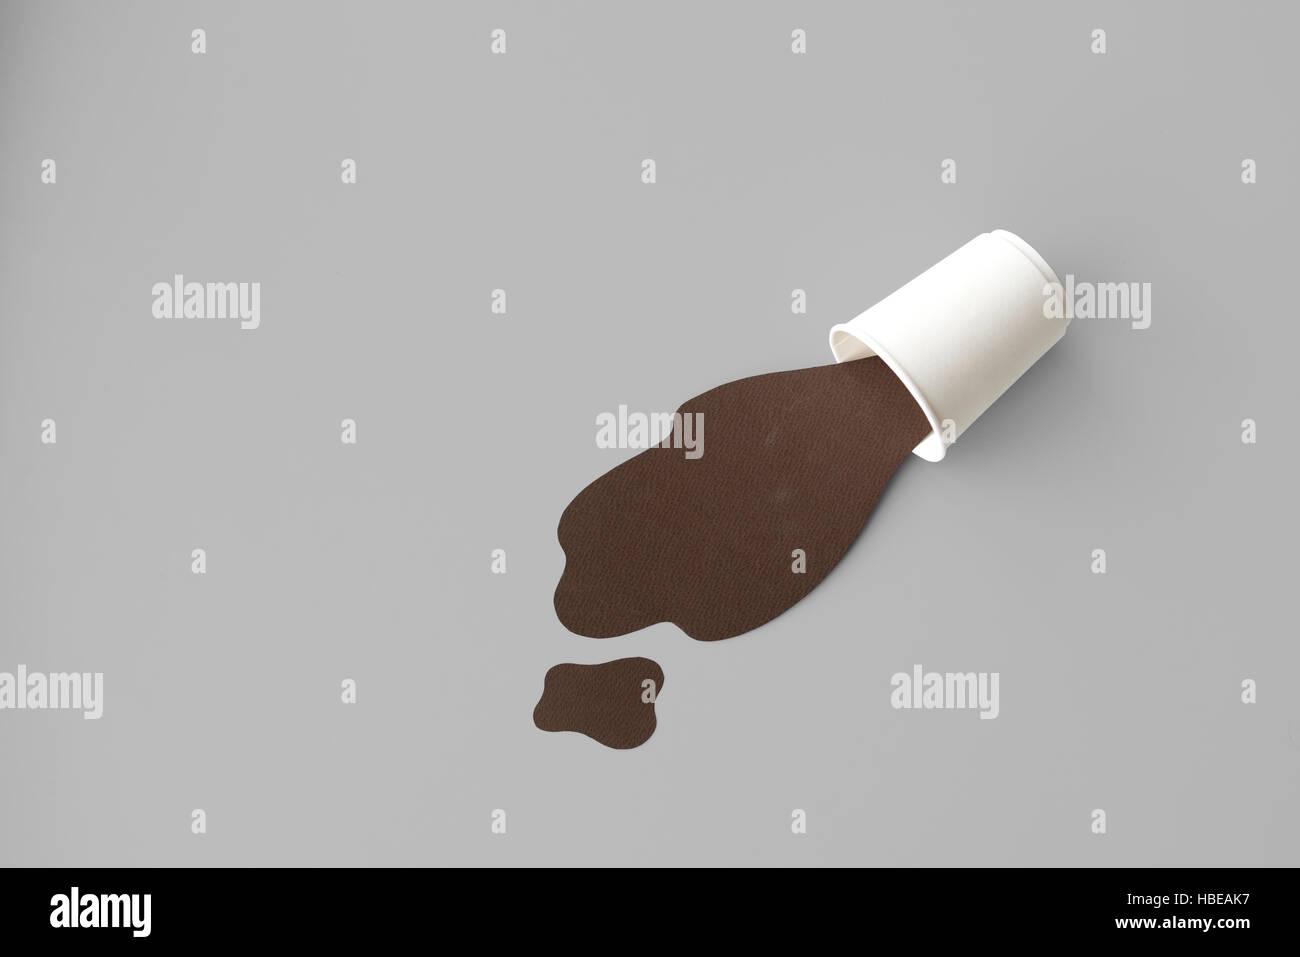 Spilled Splash Smudge Sloppy Stain Wet Beverage Concept - Stock Image